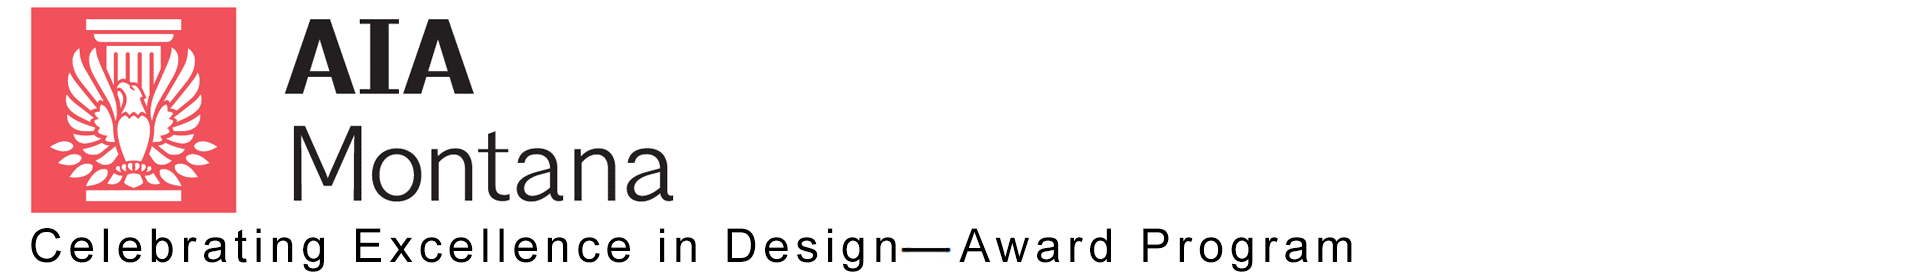 2020 AIA MT Design Awards Event Banner